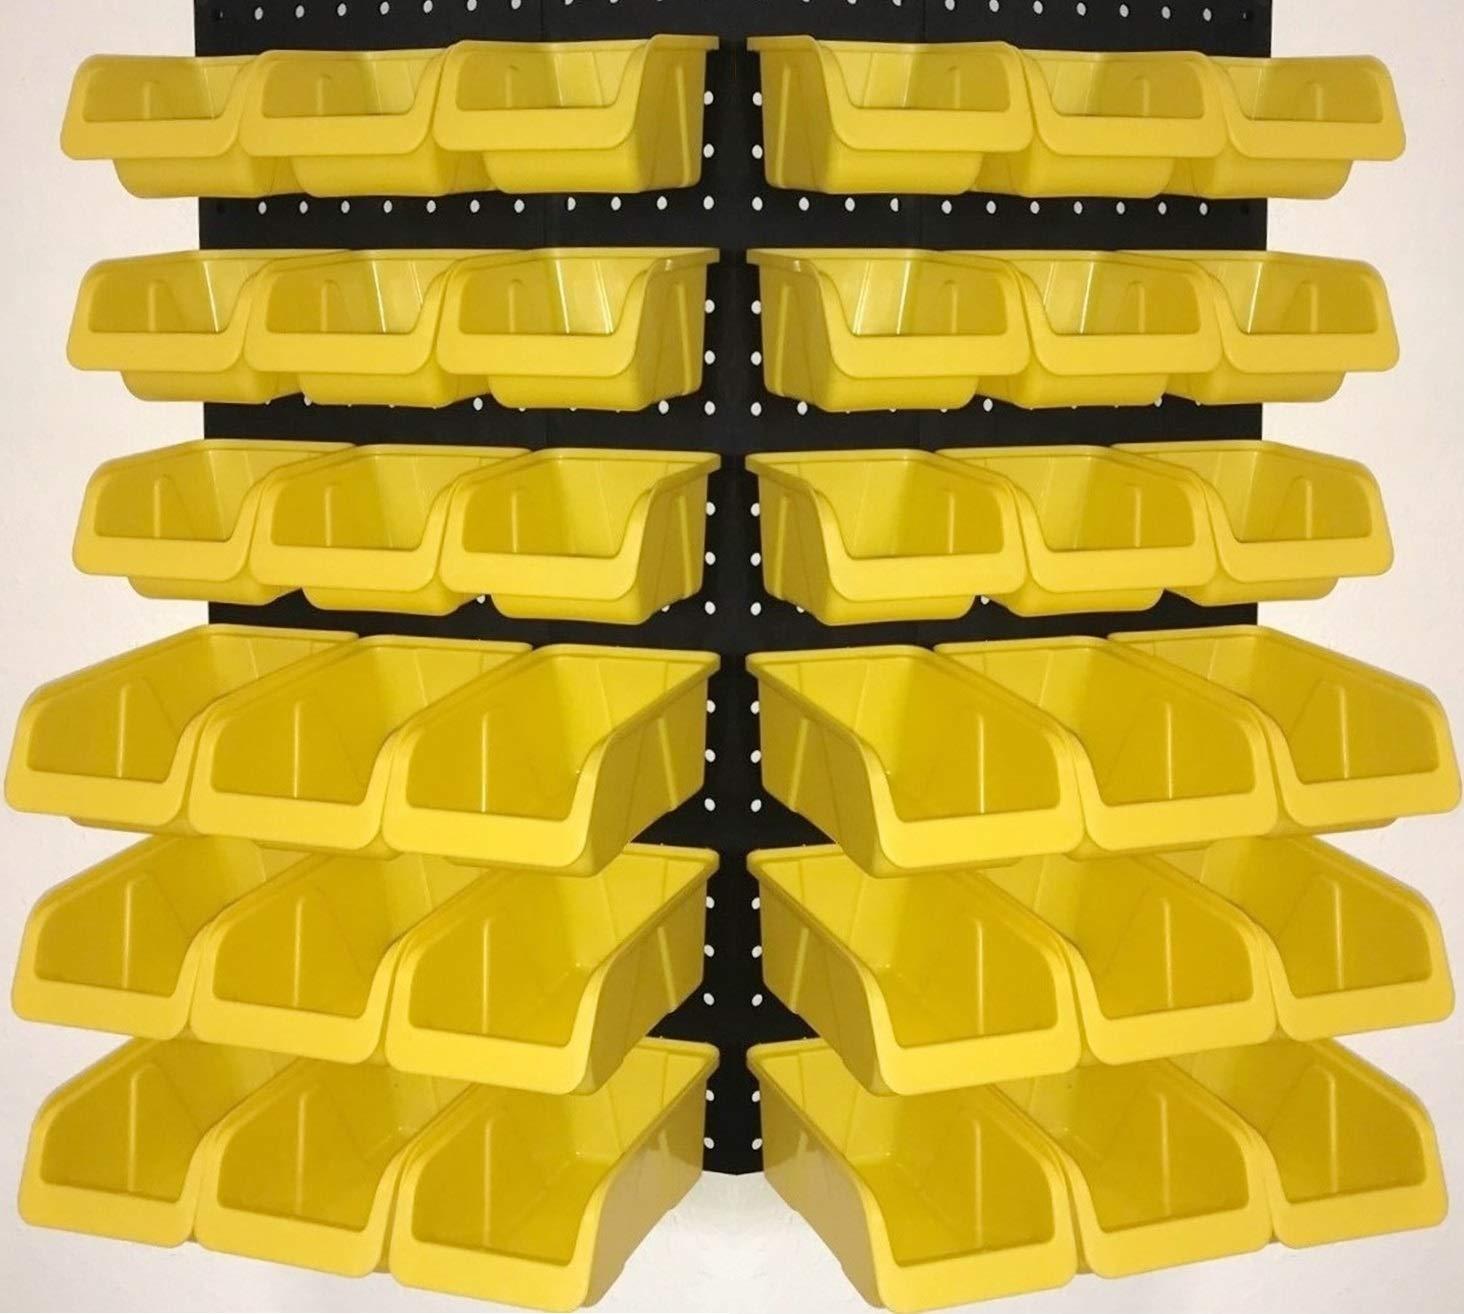 WallPeg 36 Pegboard Bins Part Bin Kit Hooks to Peg Board Panels Workbench Organizer Larger Size Bins by USA PEG